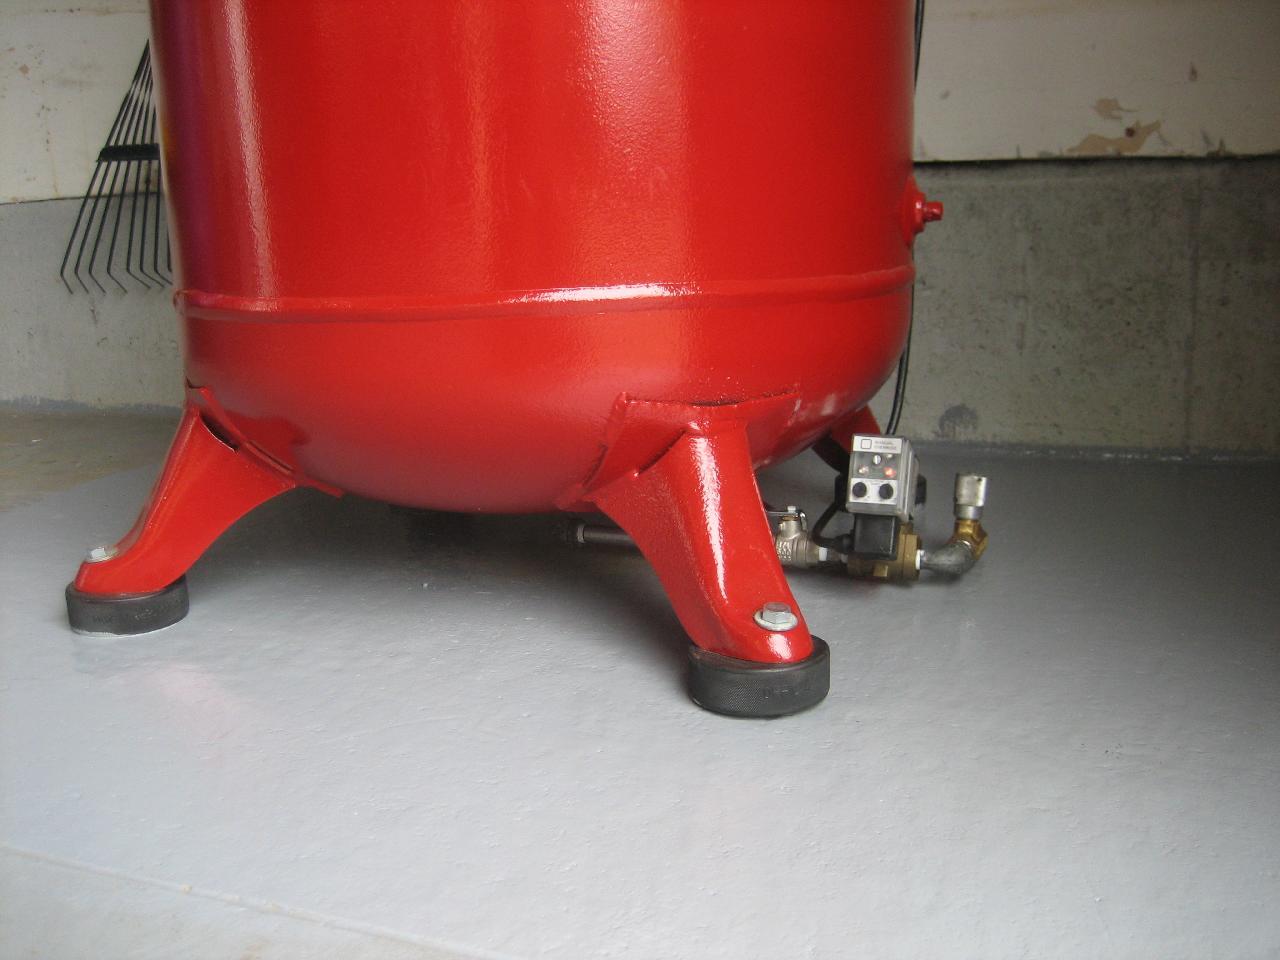 Newbie Air Compressor Questions